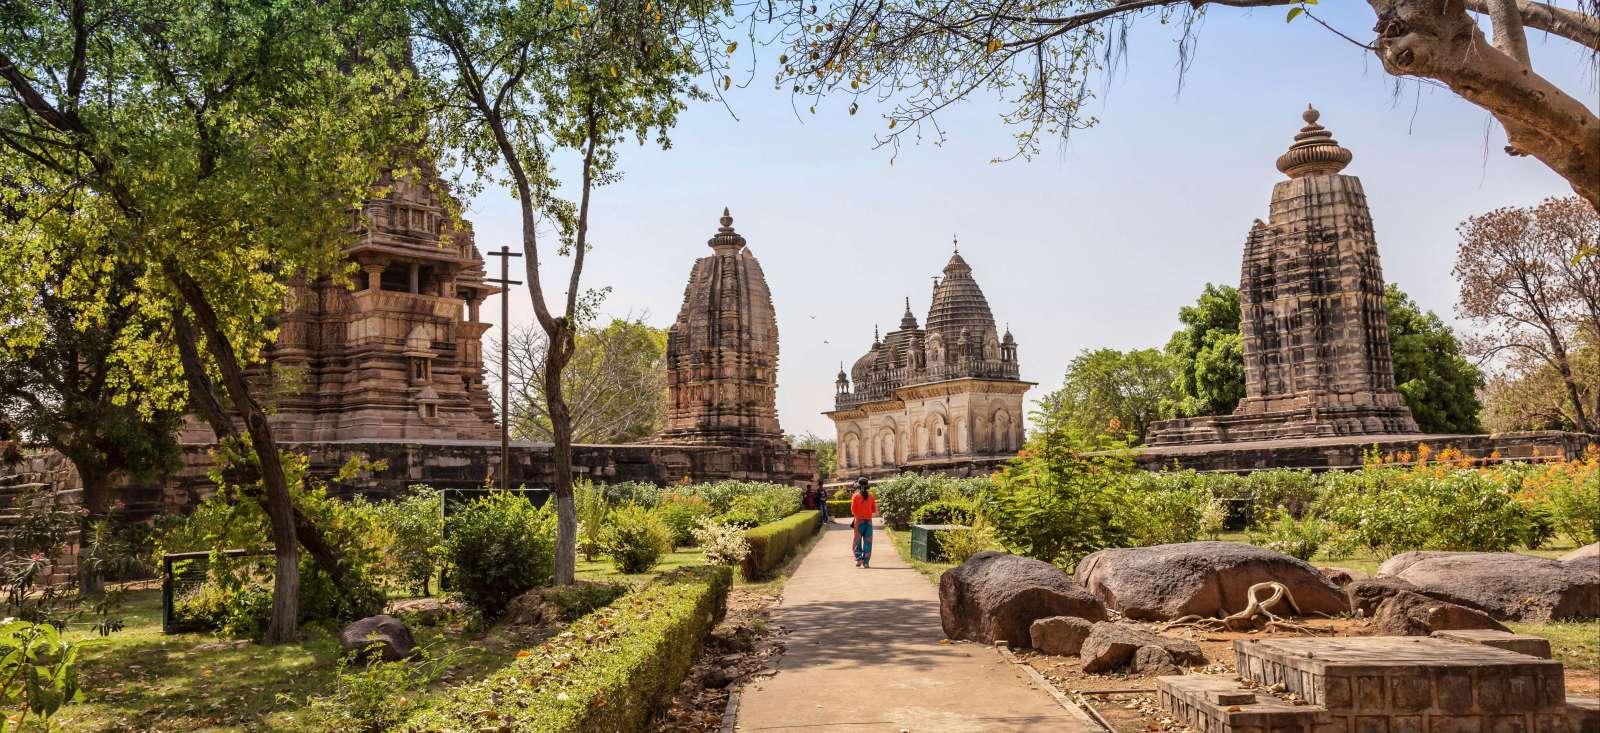 Voyage avec des animaux : Inde : Rajasthan et trésors du Madya Pradesh